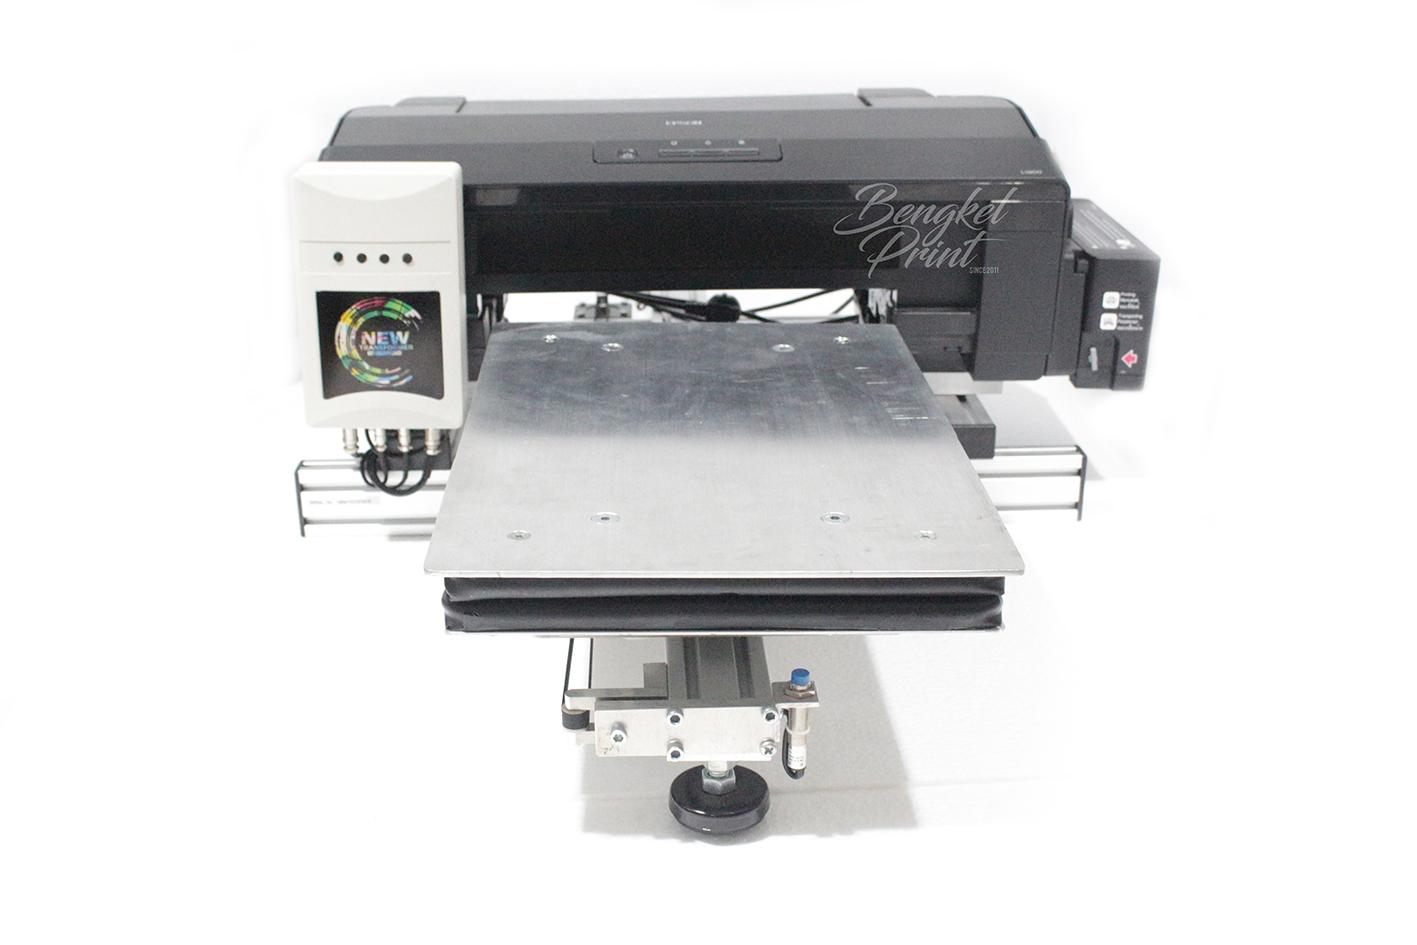 printer-dtg-a3